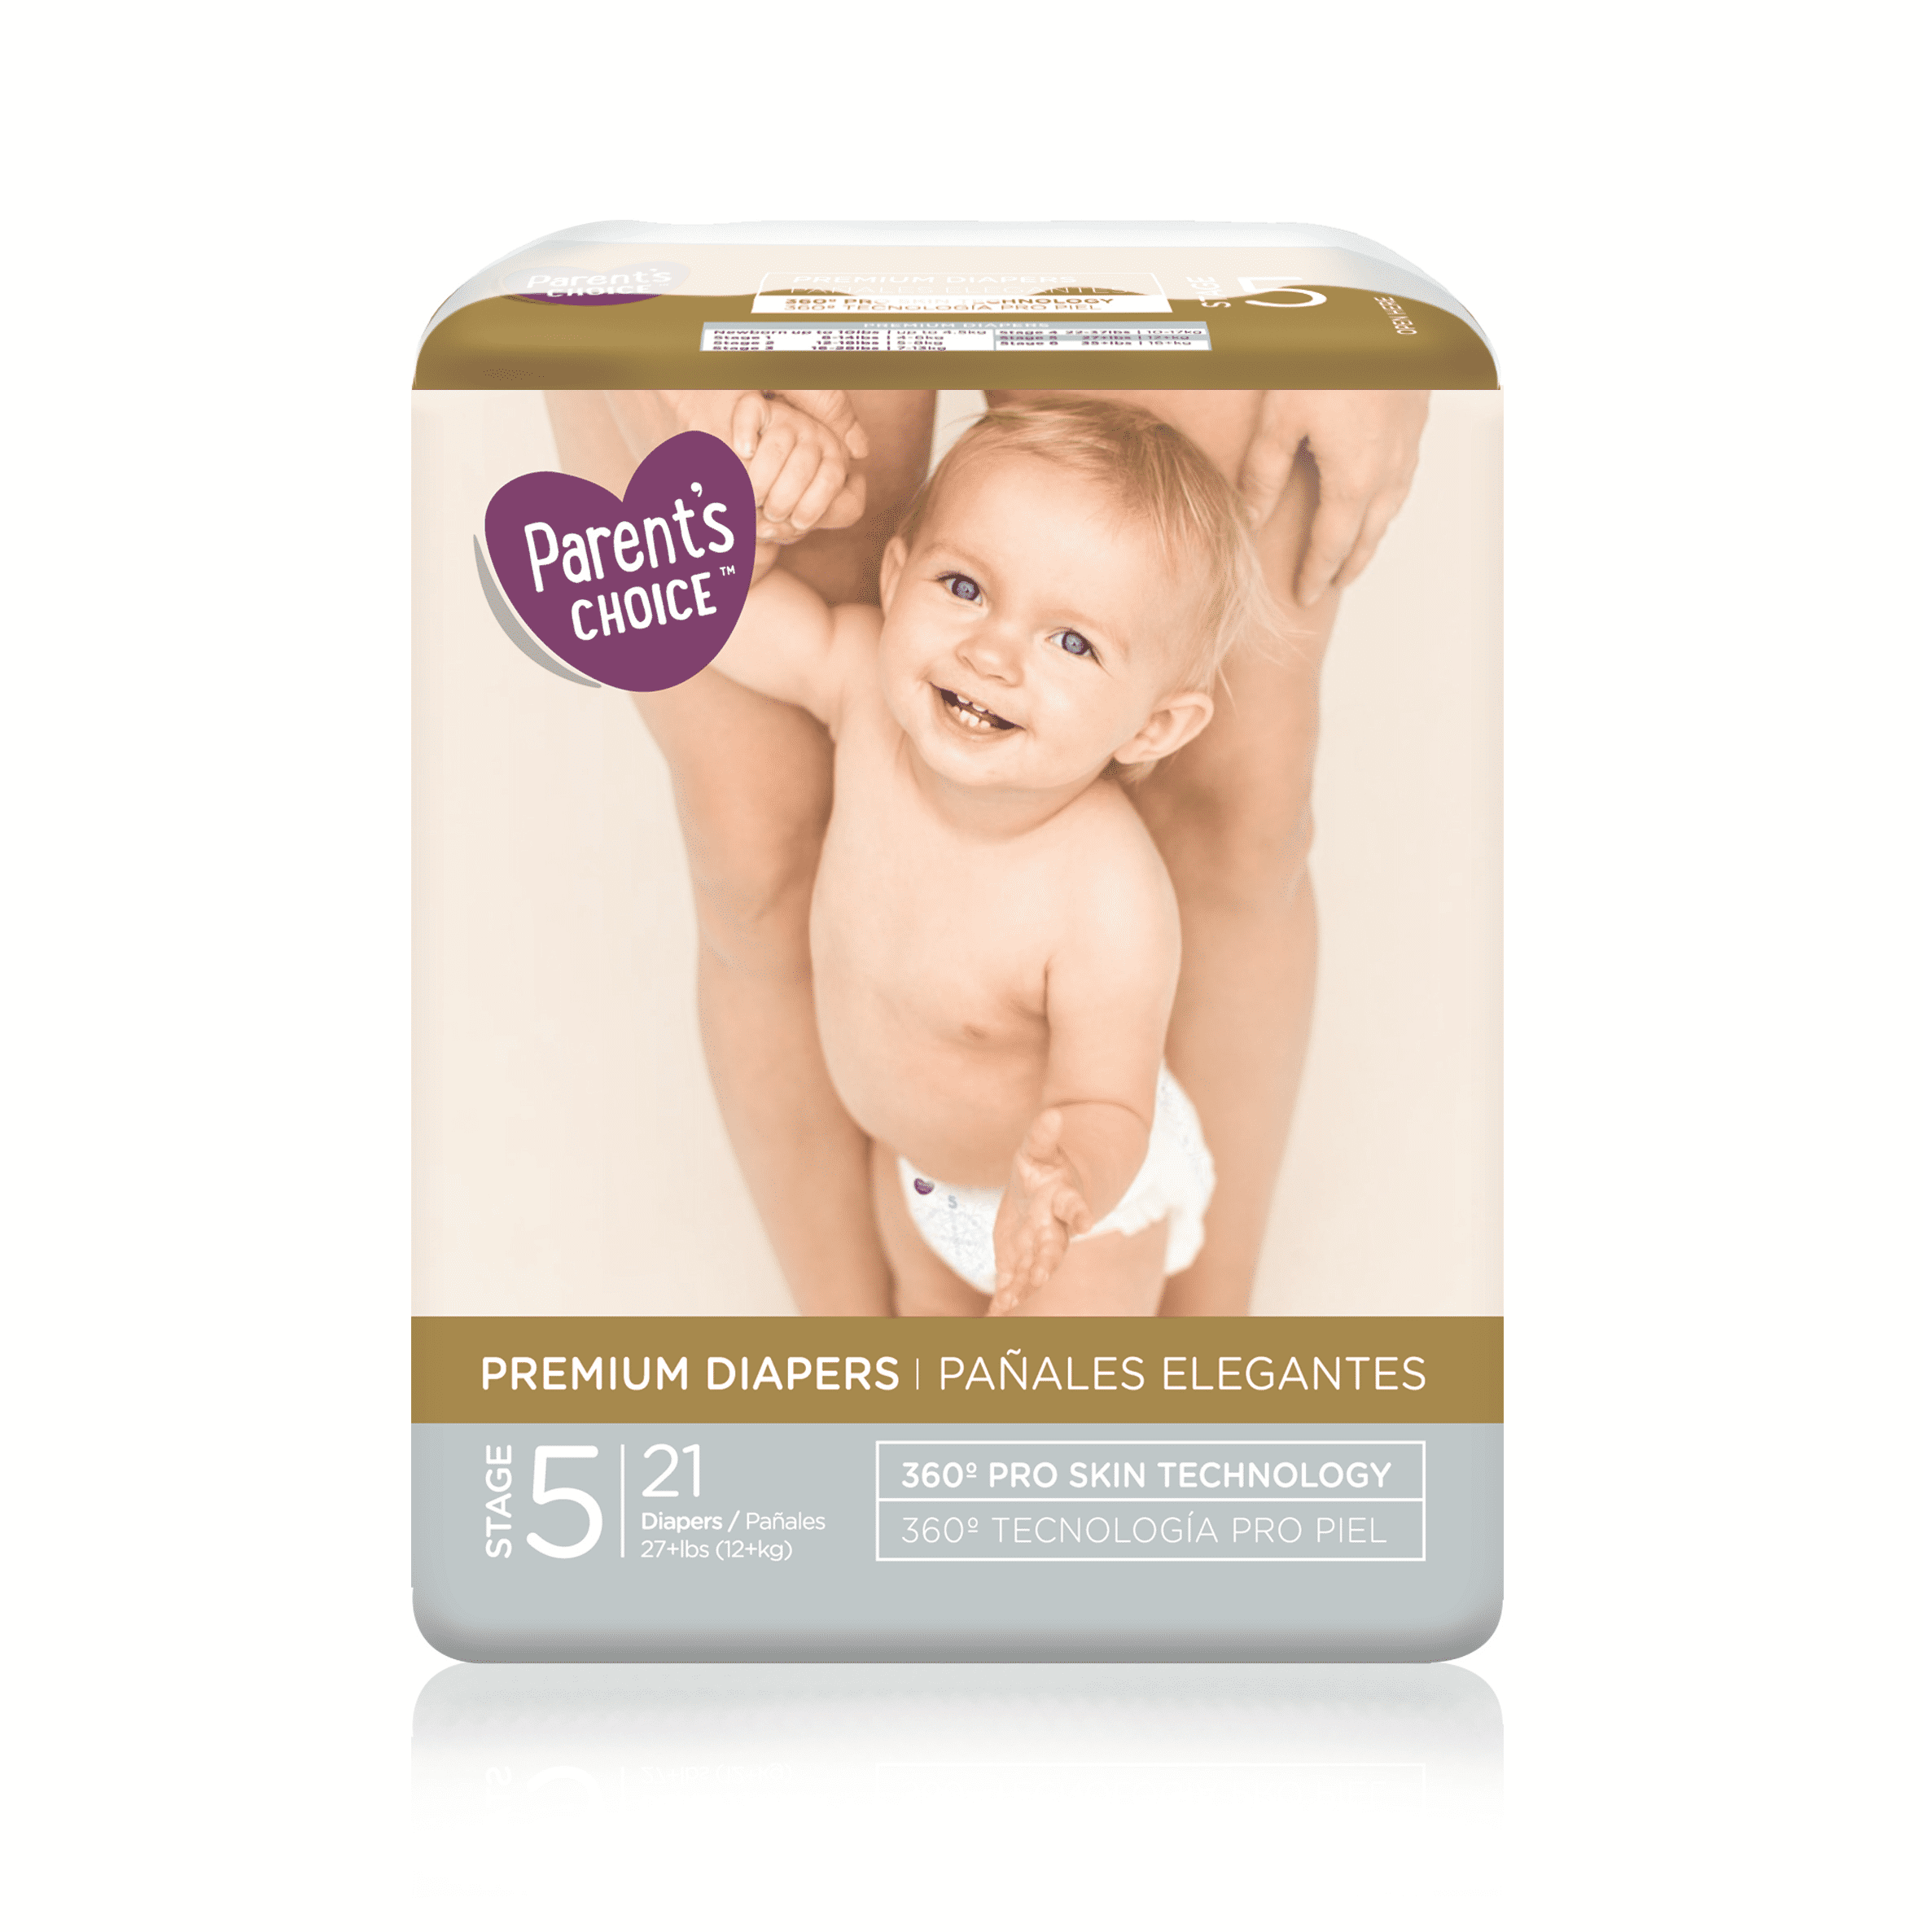 Parent's Choice Premium Diapers, Size 5, 21 Diapers